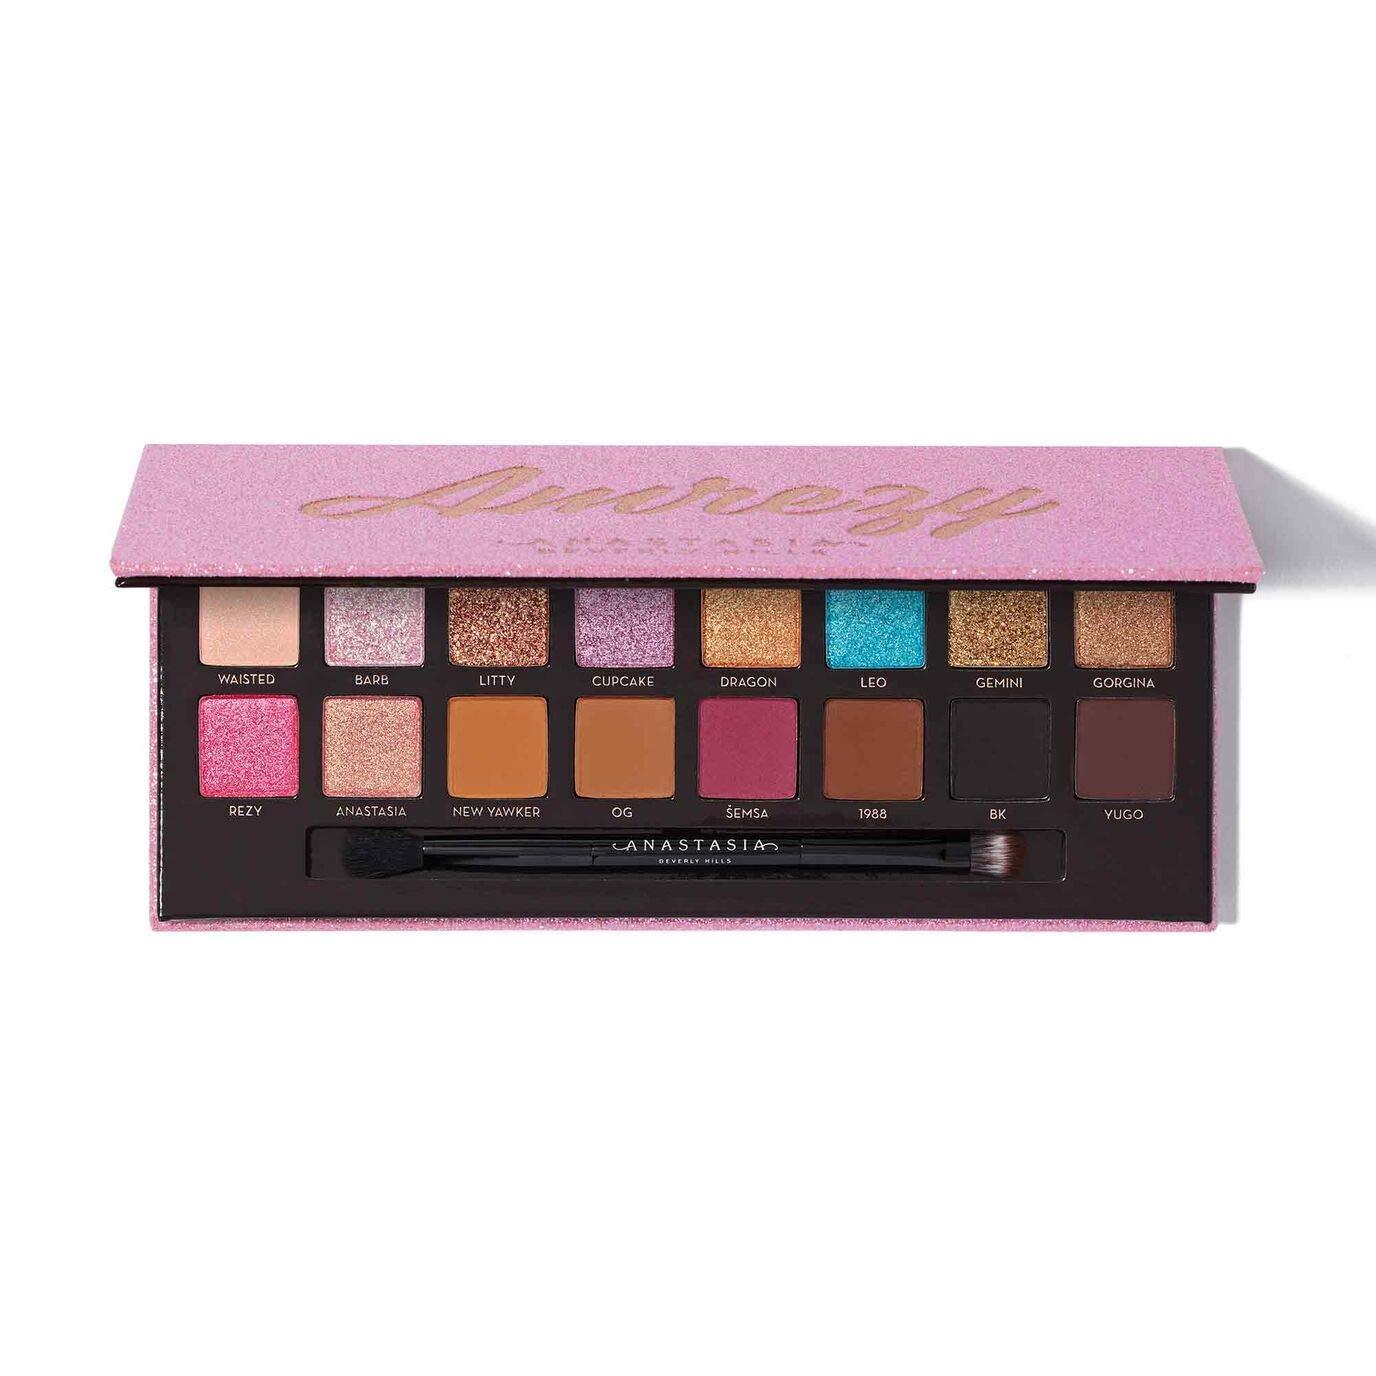 Anastasia Beverly Hills Eyeshadow Palette, Amrezy